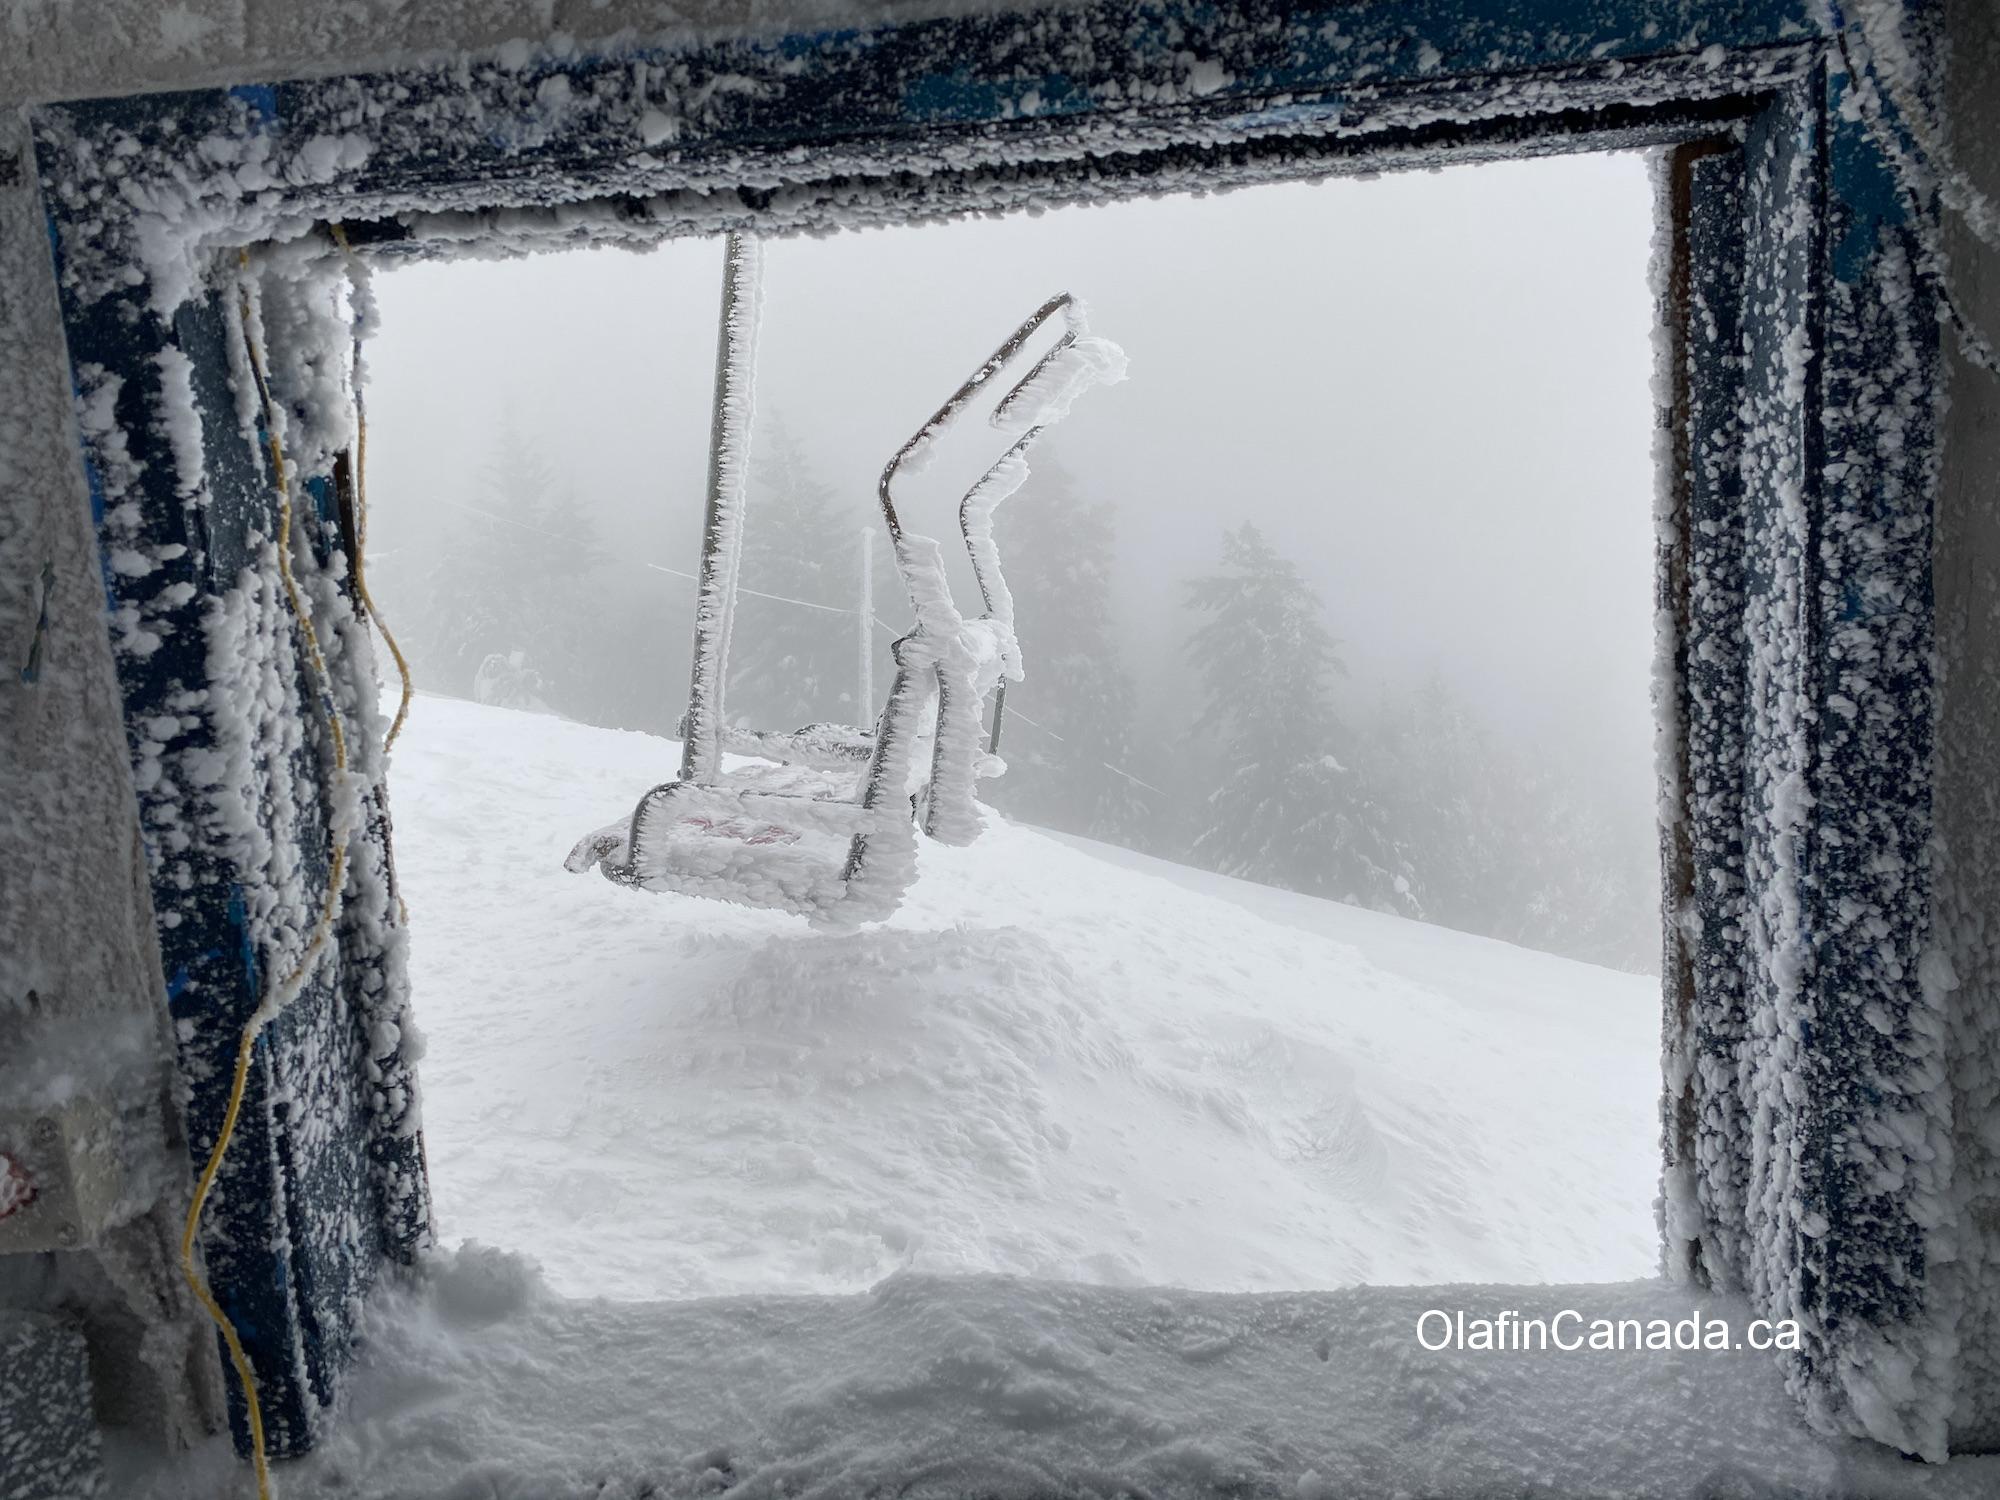 Frozen chair on abandoned ski resort Crystal Mountain in West Kelowna #olafincanada #britishcolumbia #discoverbc #abandonedbc #crystalmountain #westkelowna